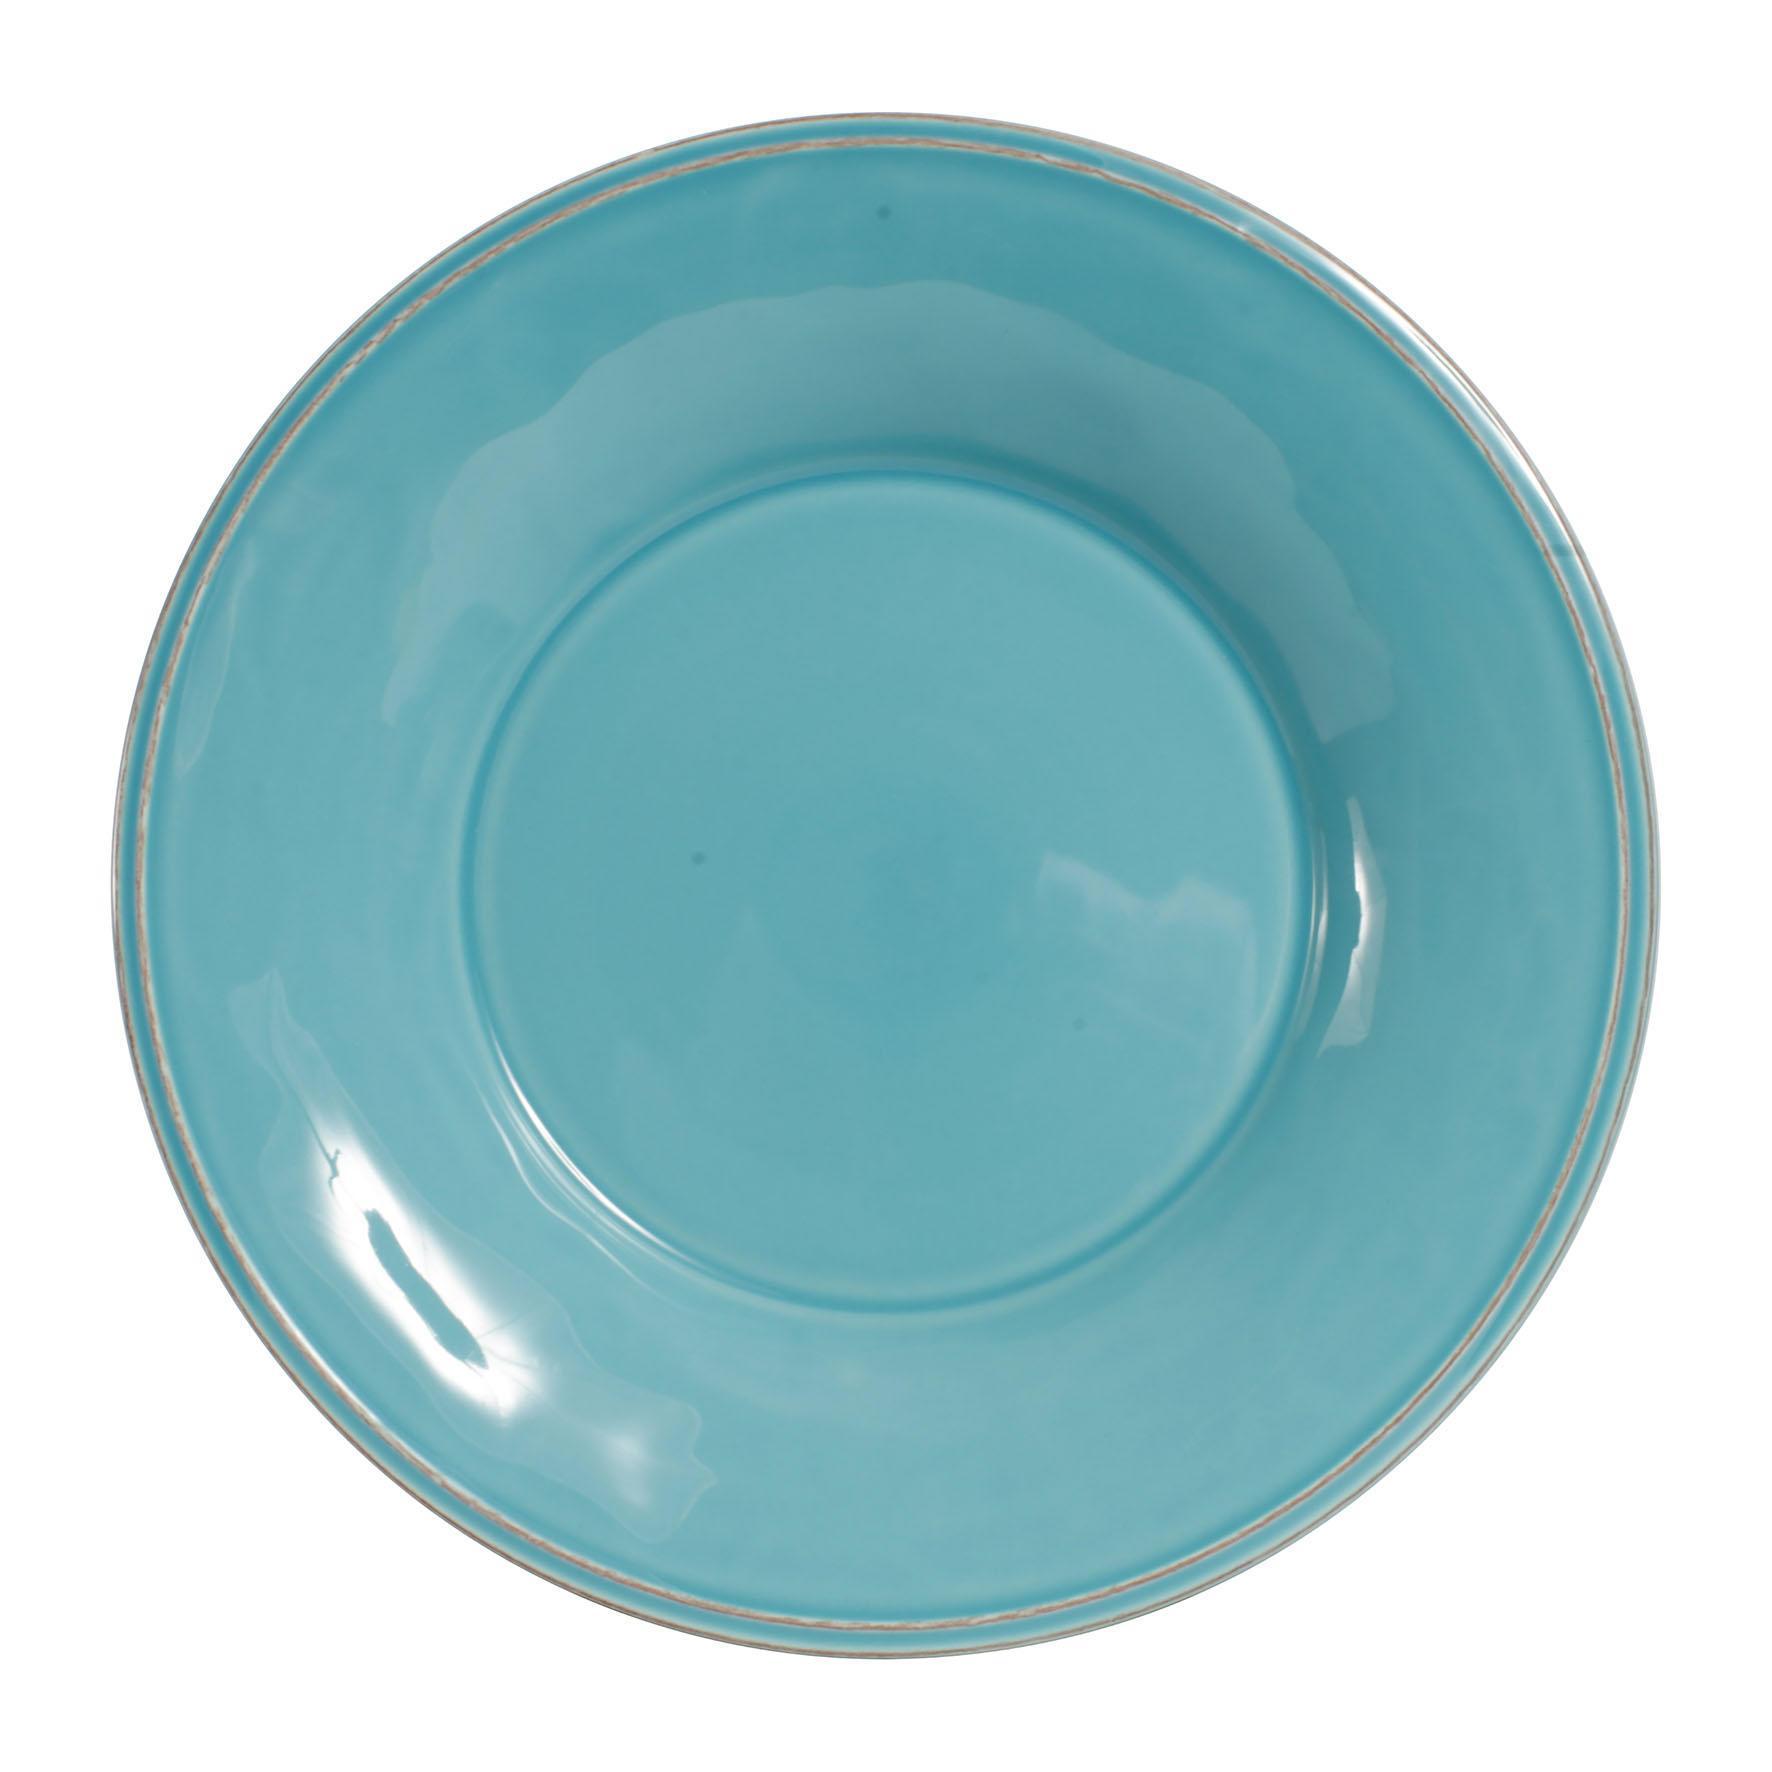 Côté Table Polévkový talíř Constance Turquoise, modrá barva, zelená barva, keramika